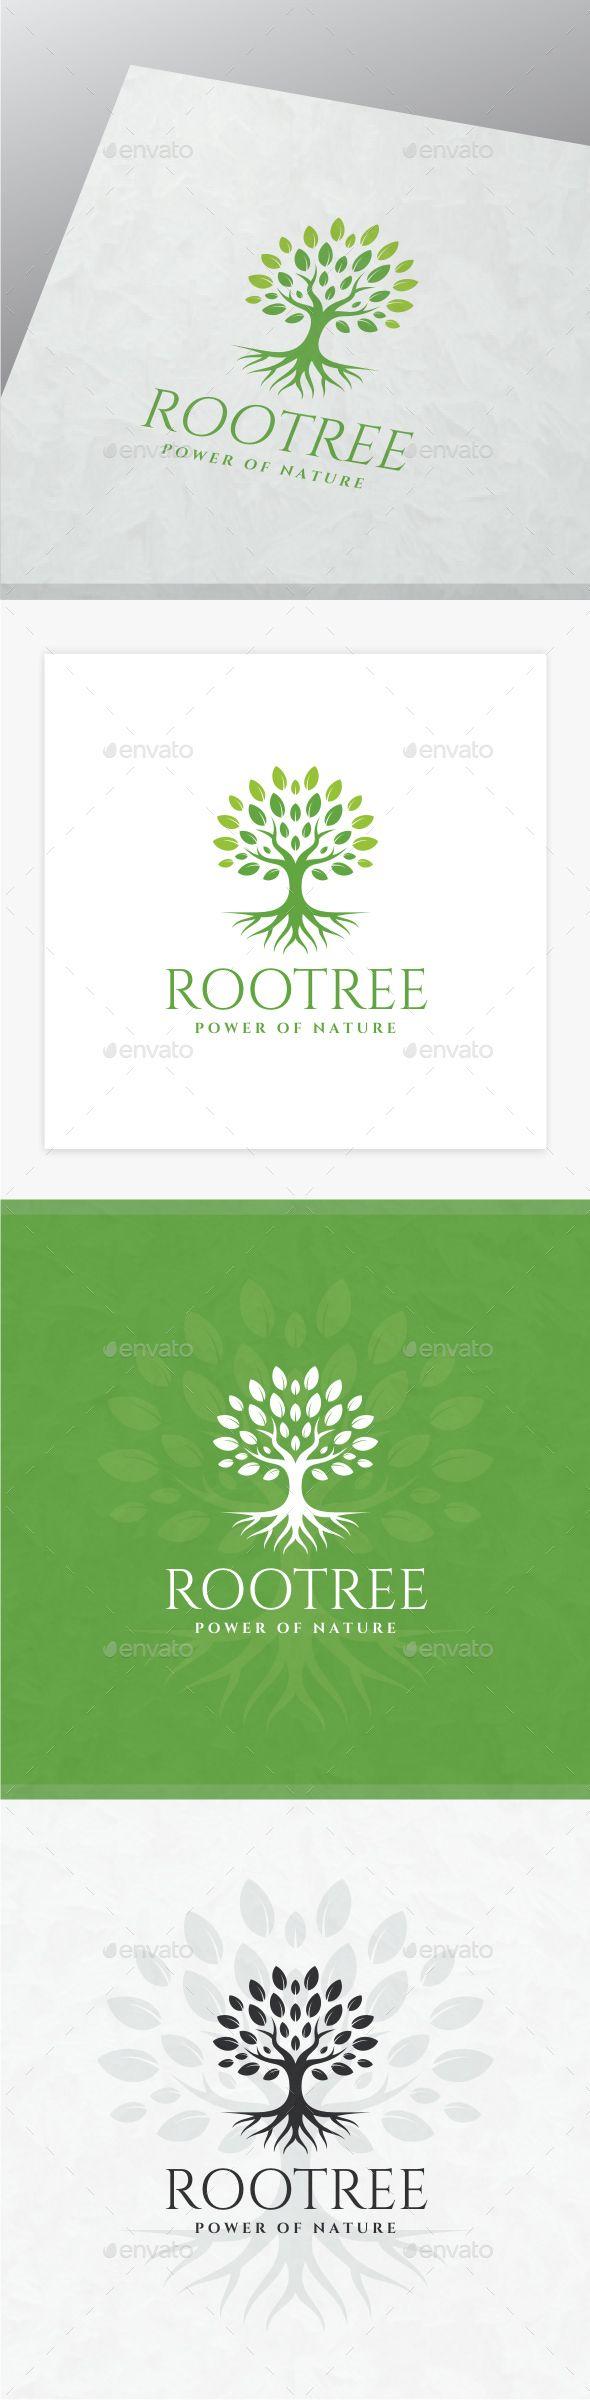 Root Tree Logo Template PSD, Vector EPS, AI Illustrator, CorelDRAW CDR